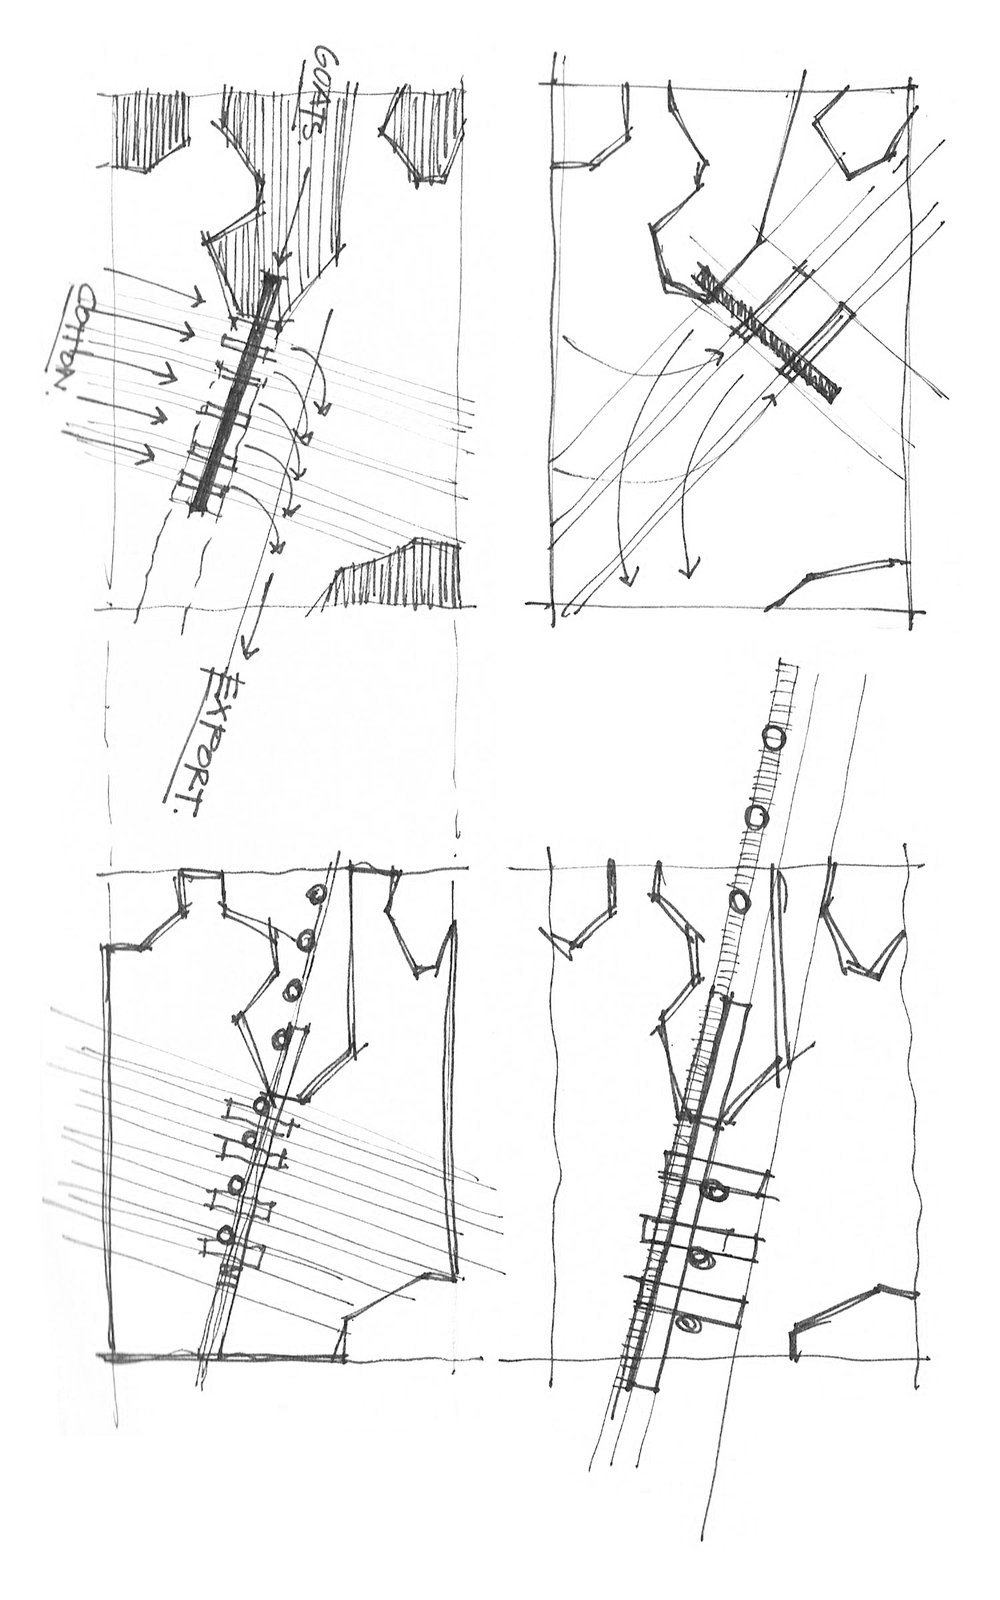 mohair diagrams.jpg